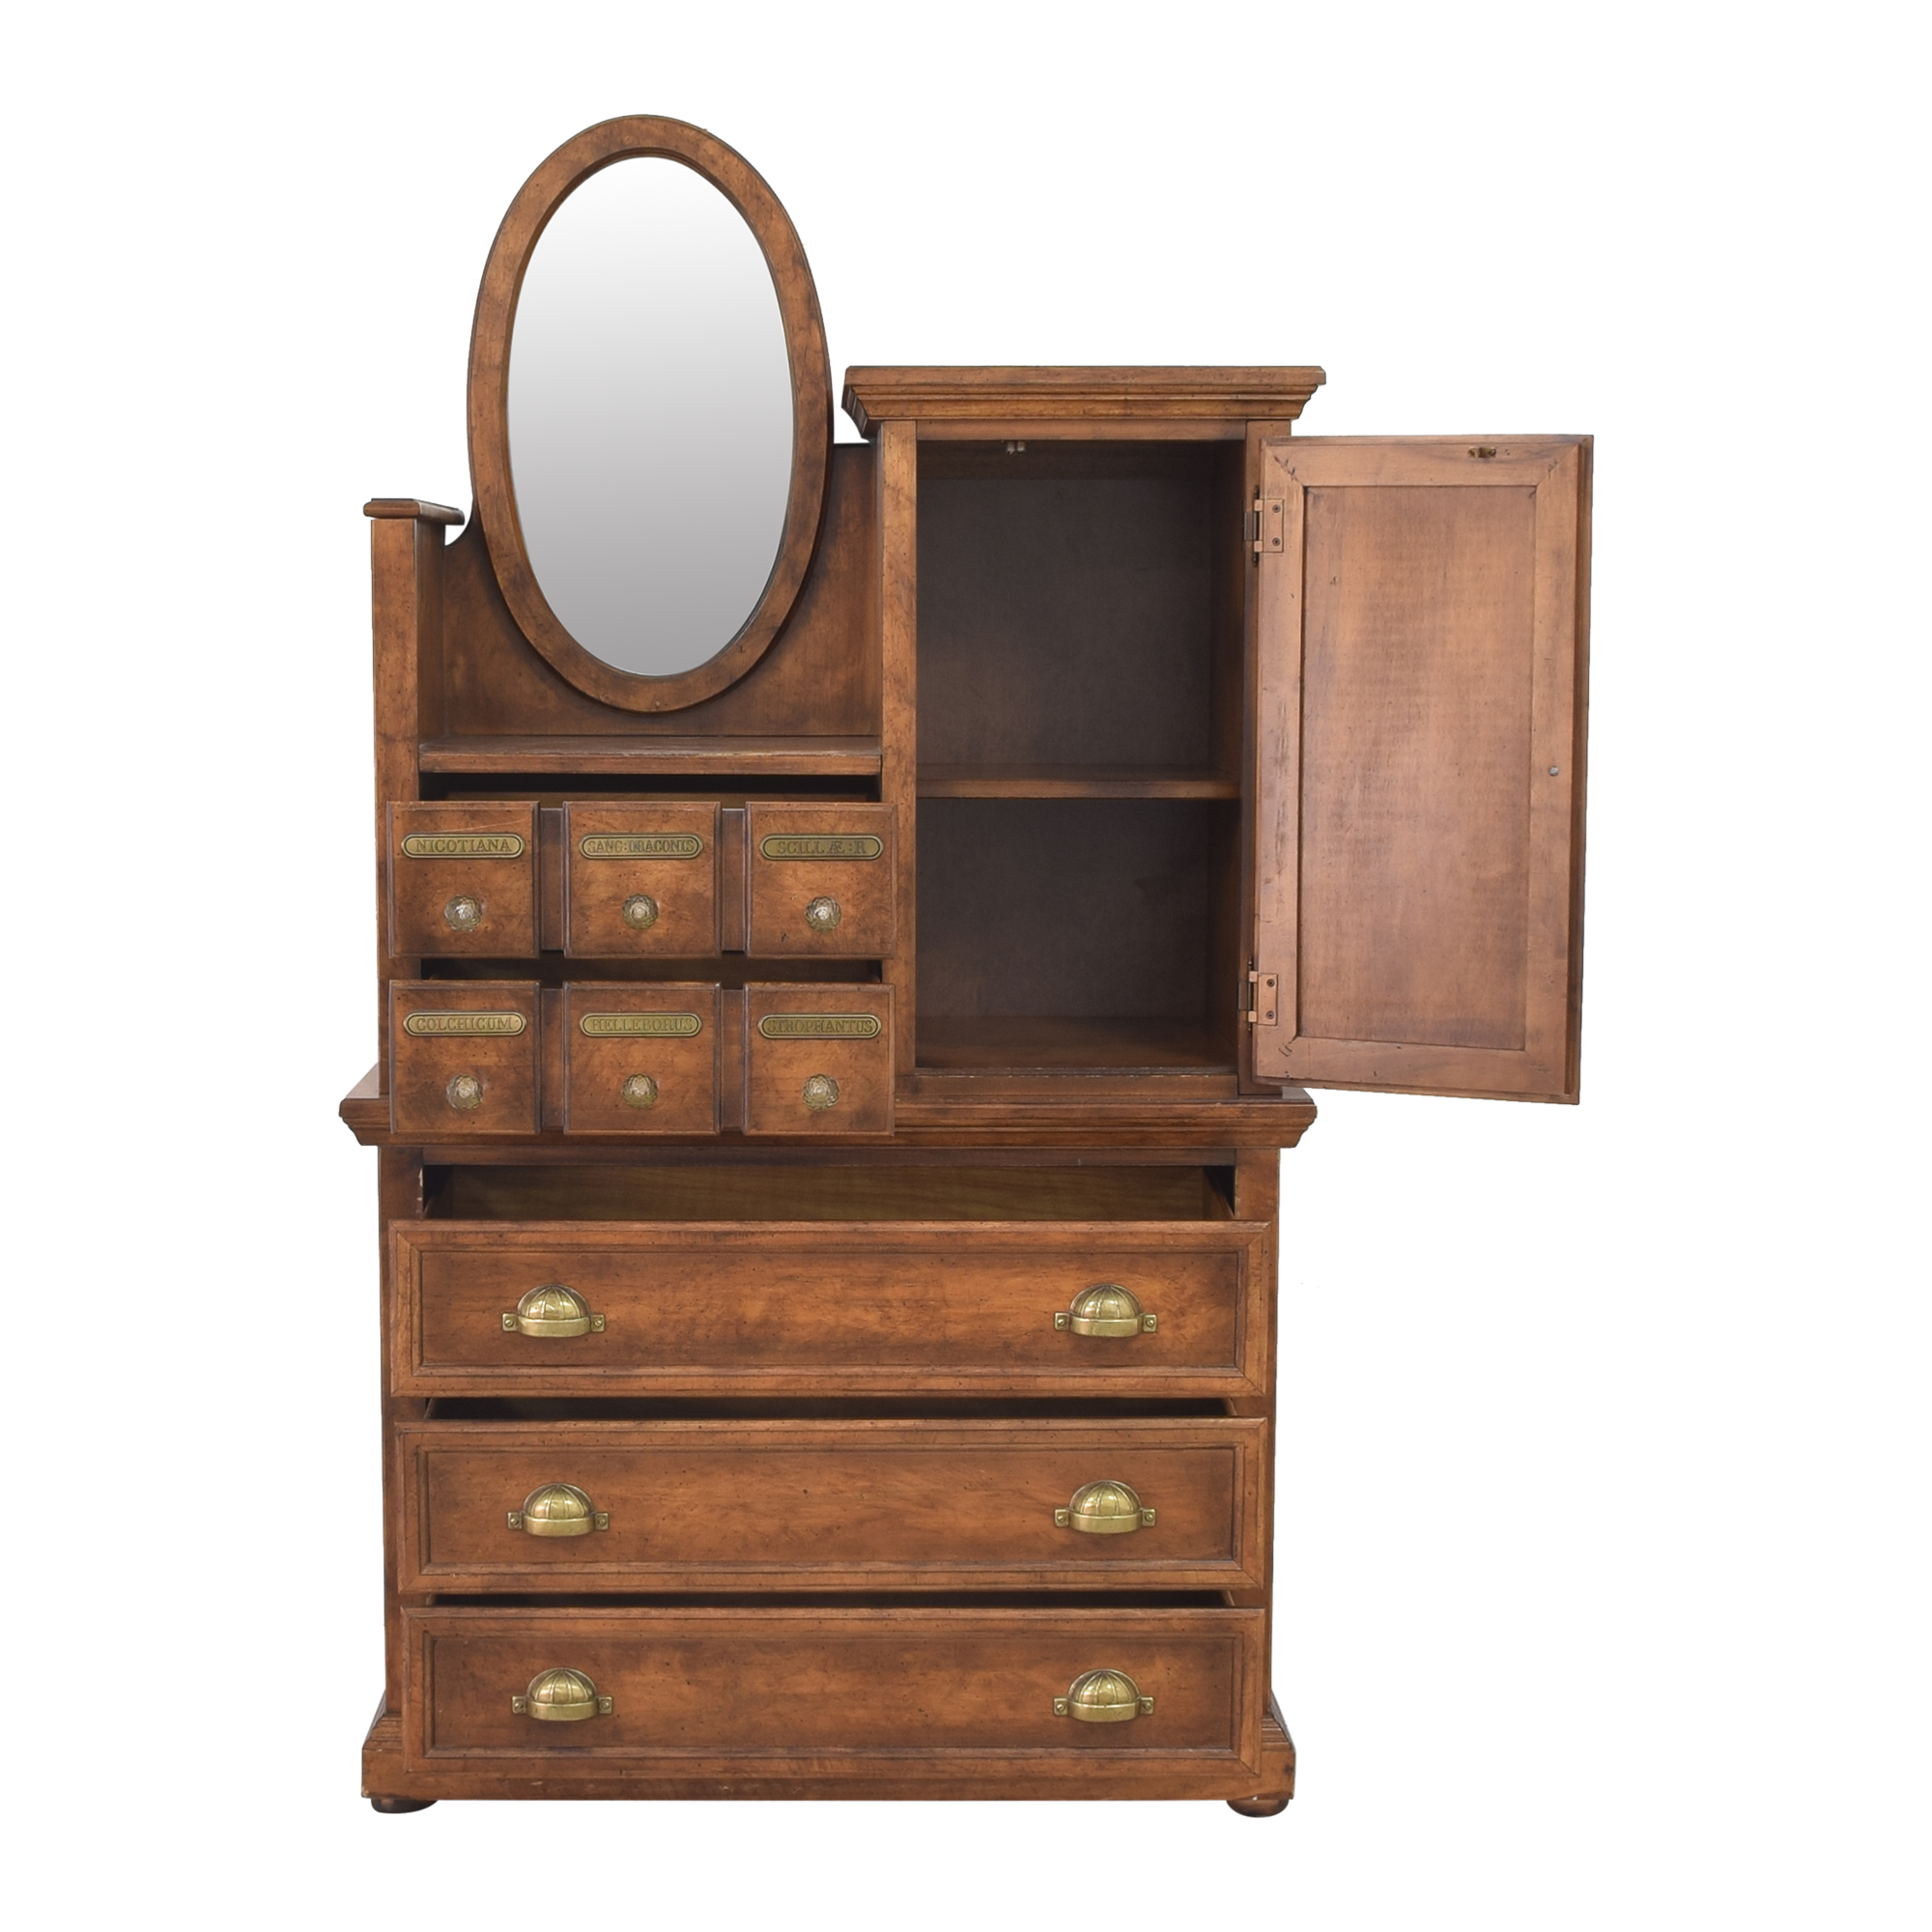 Antique Apothecary Wardrobe with Mirror